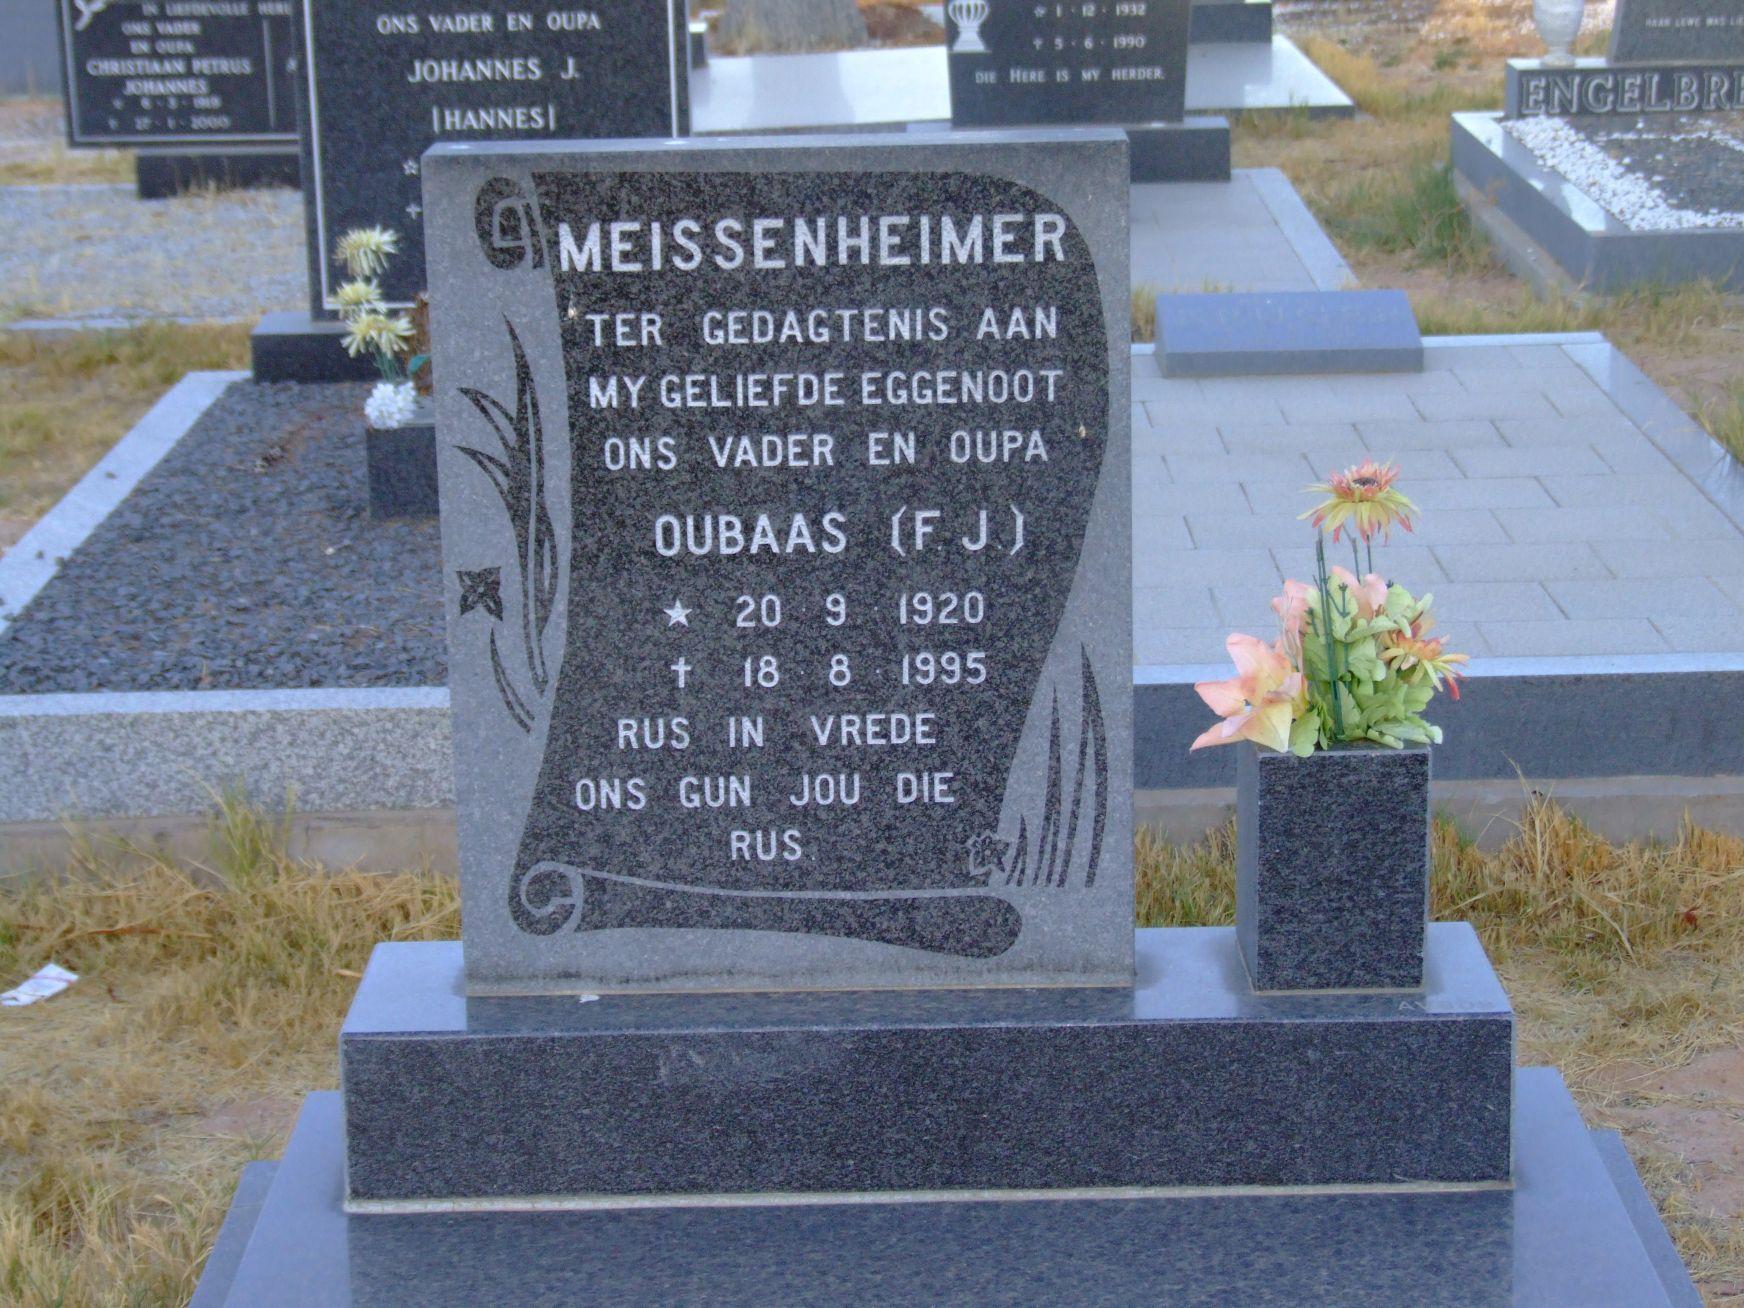 Meissenheimer, Oubaas (F.J.)